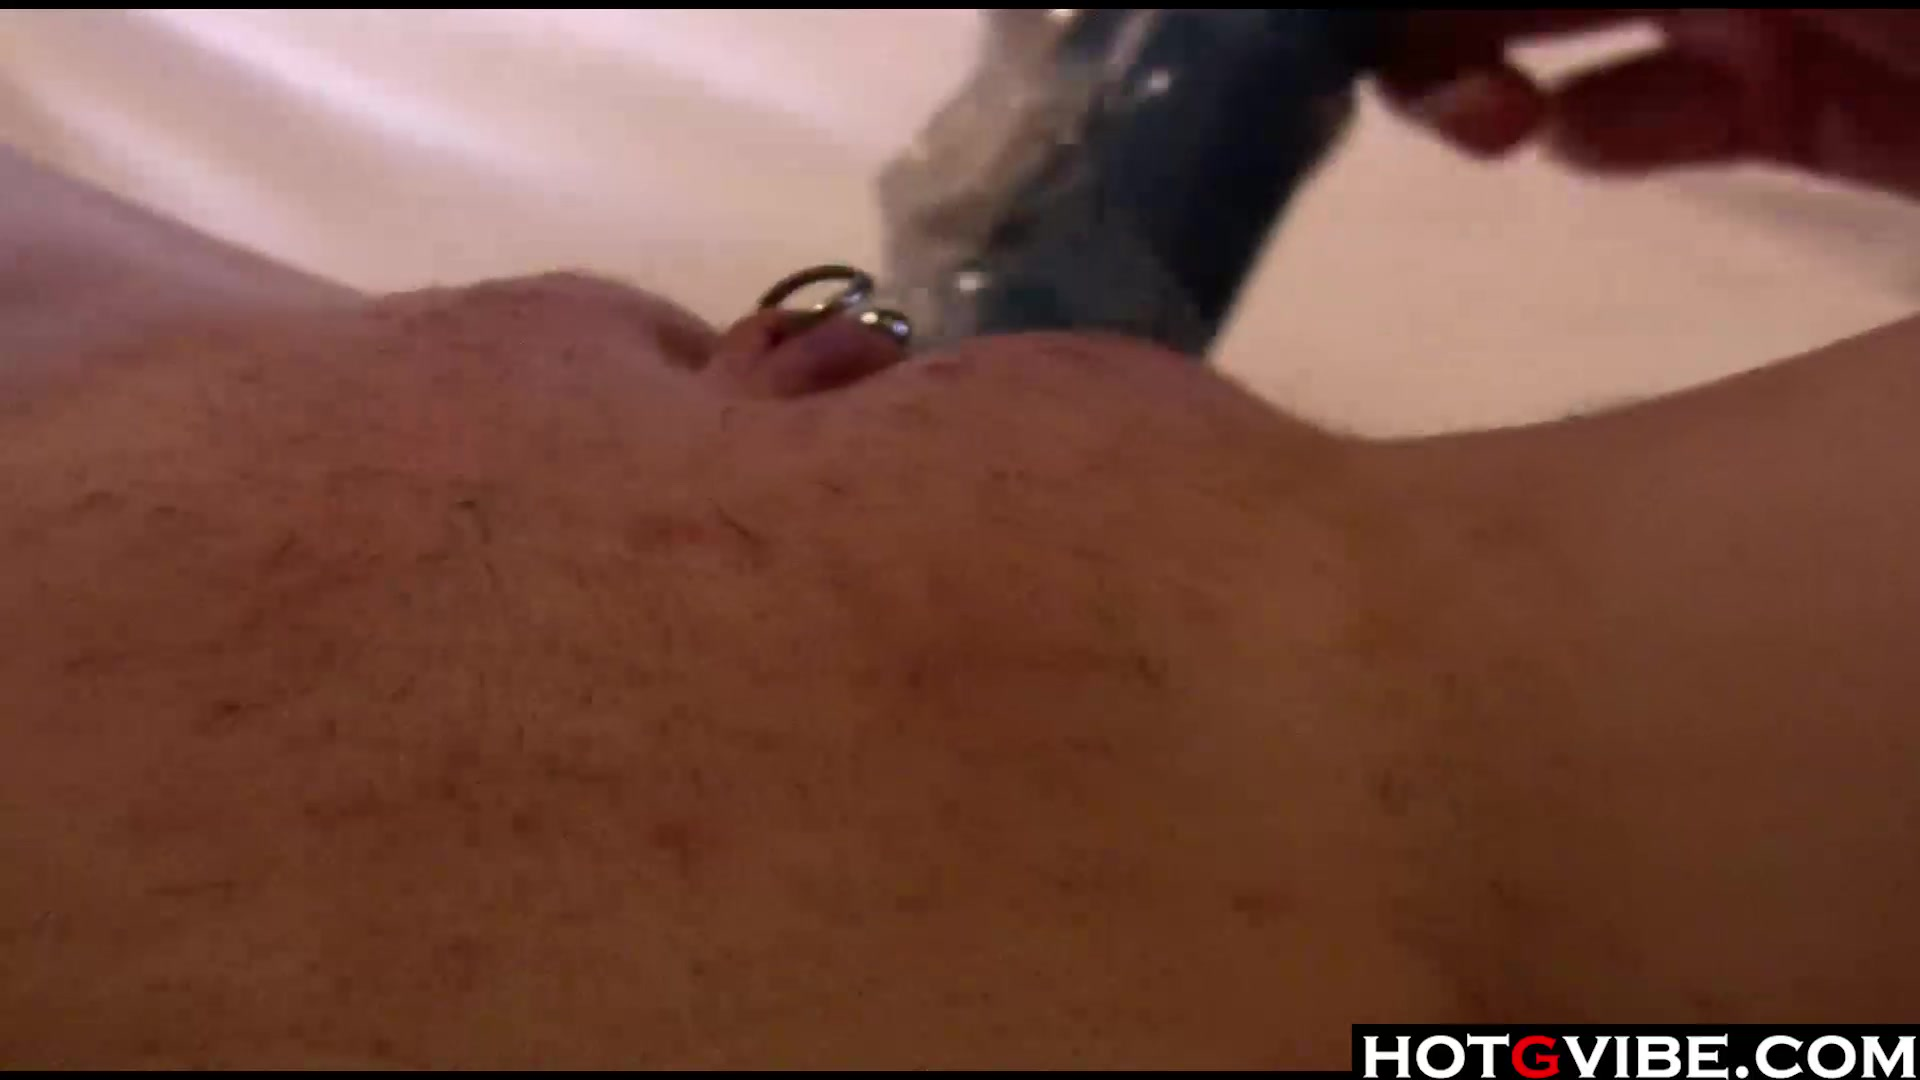 mature women nude tumbler Adult Videos